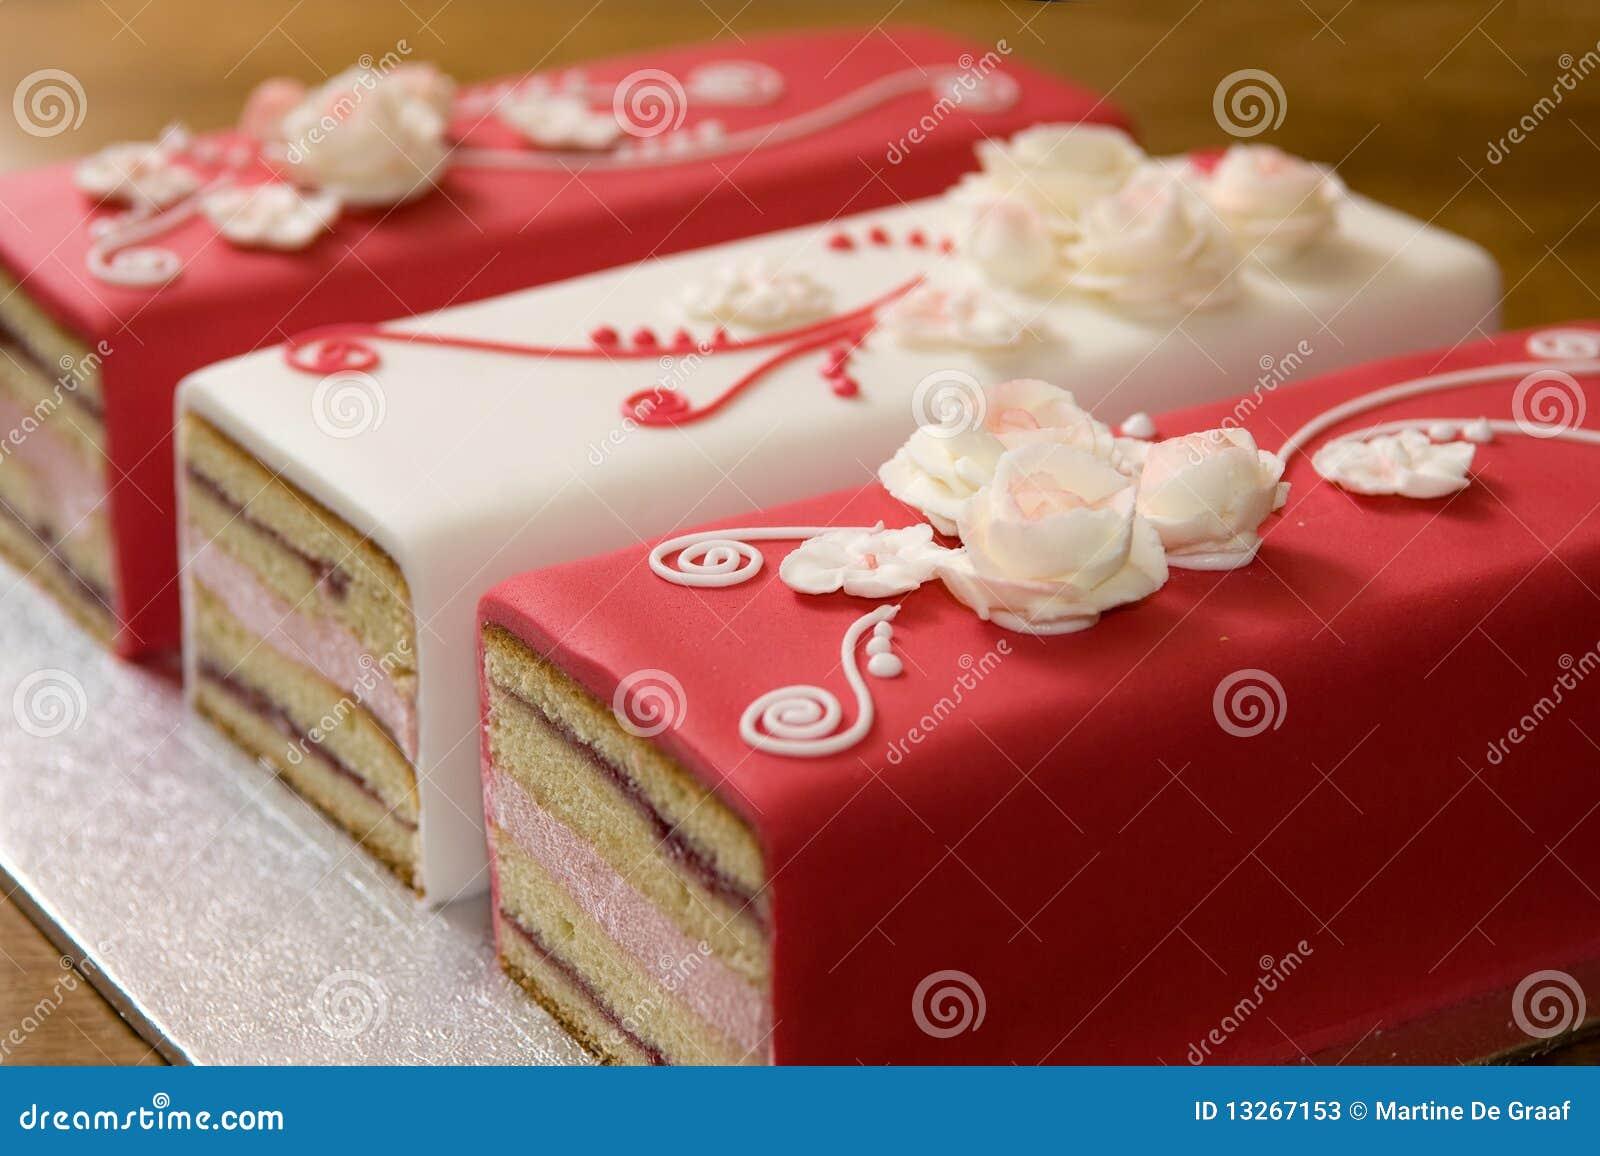 romantic cakes stock photos image 13267153 clip art candles clip art candle images